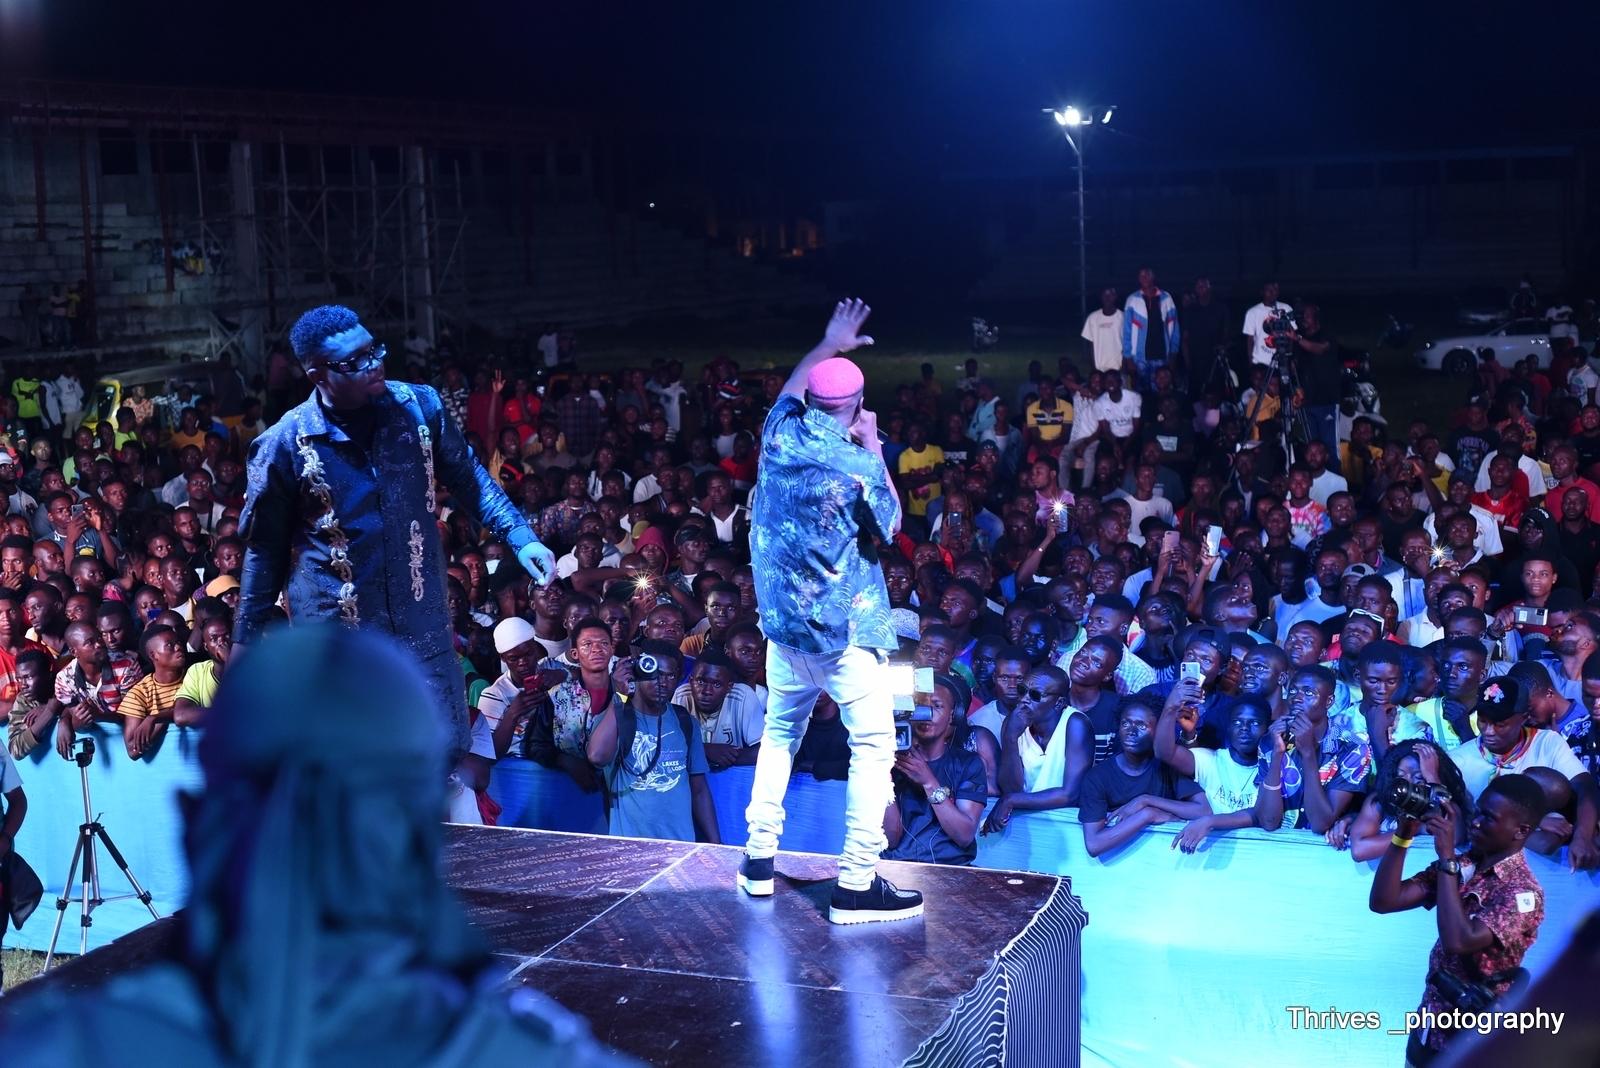 Ruger performing at Jumabee Inspires Concert 2021 held in Lokoja, Kogi State